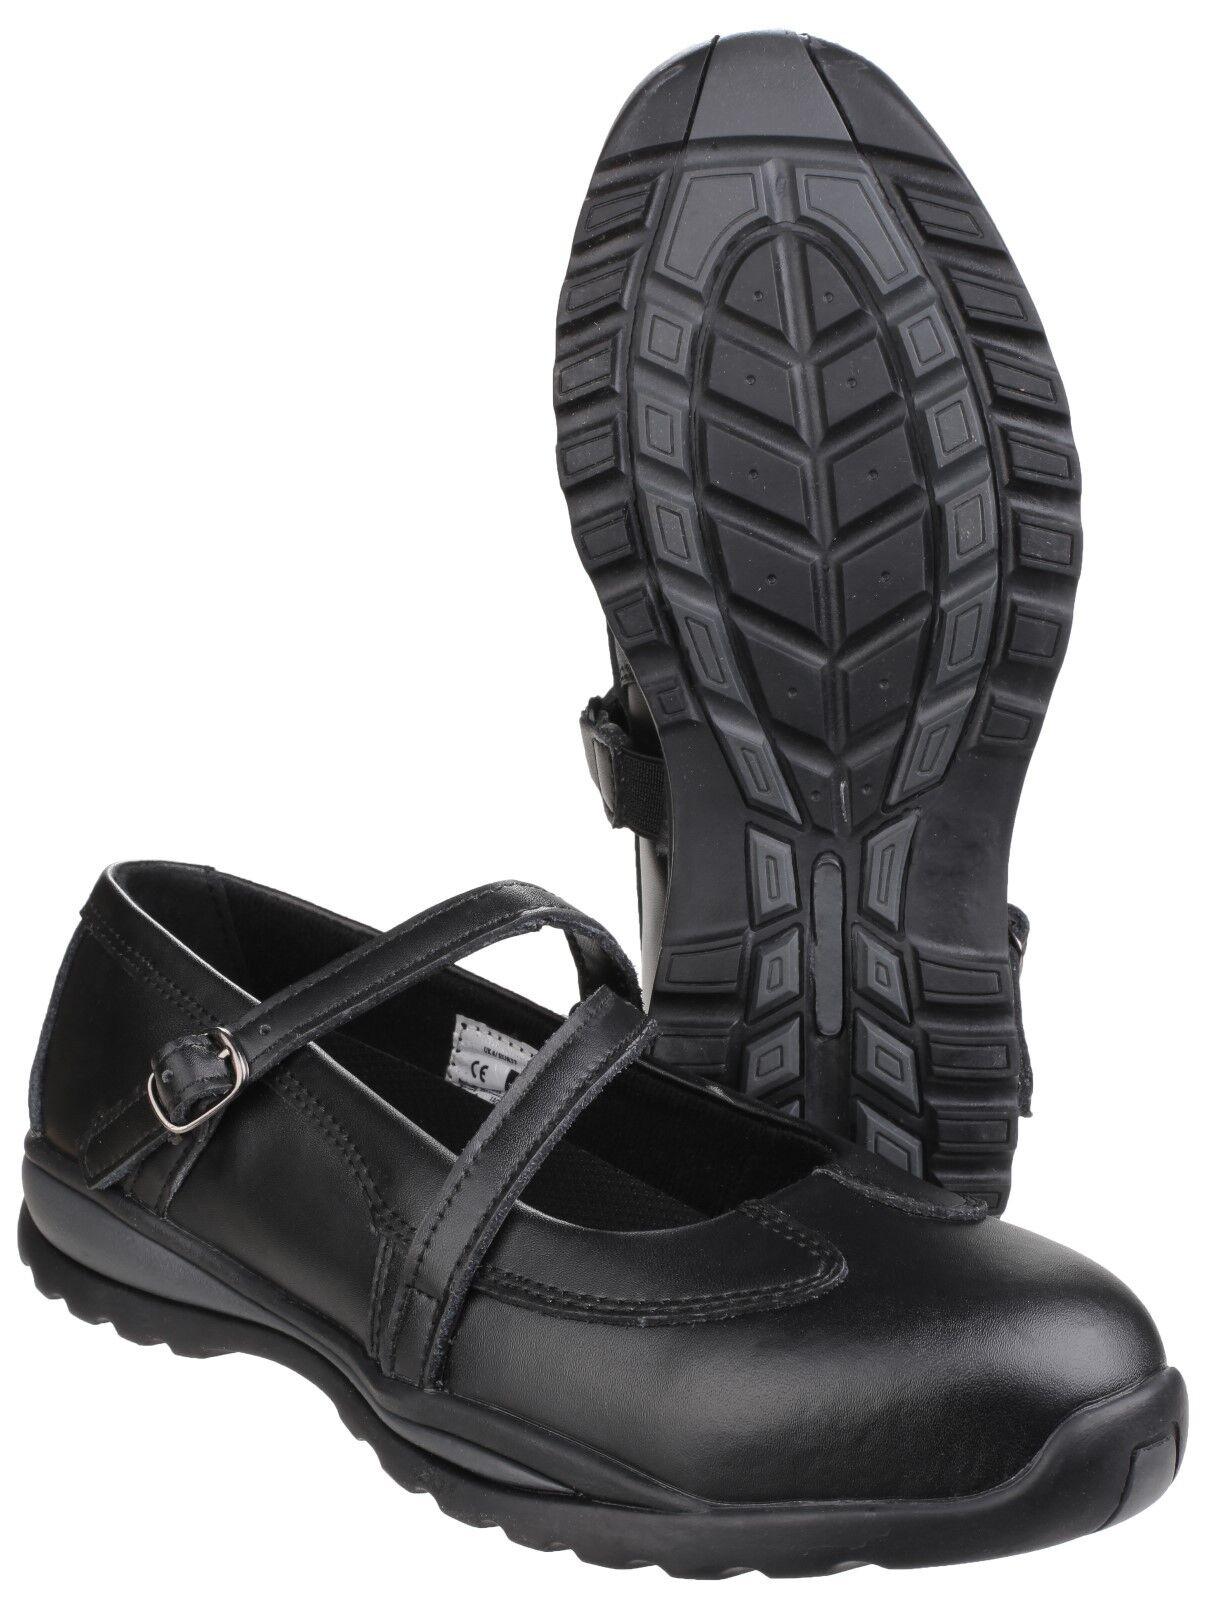 Amblers FS55 Safety donna  Steel Toe Cap scarpe Leather Buckle Strap UK3 -9  grandi risparmi